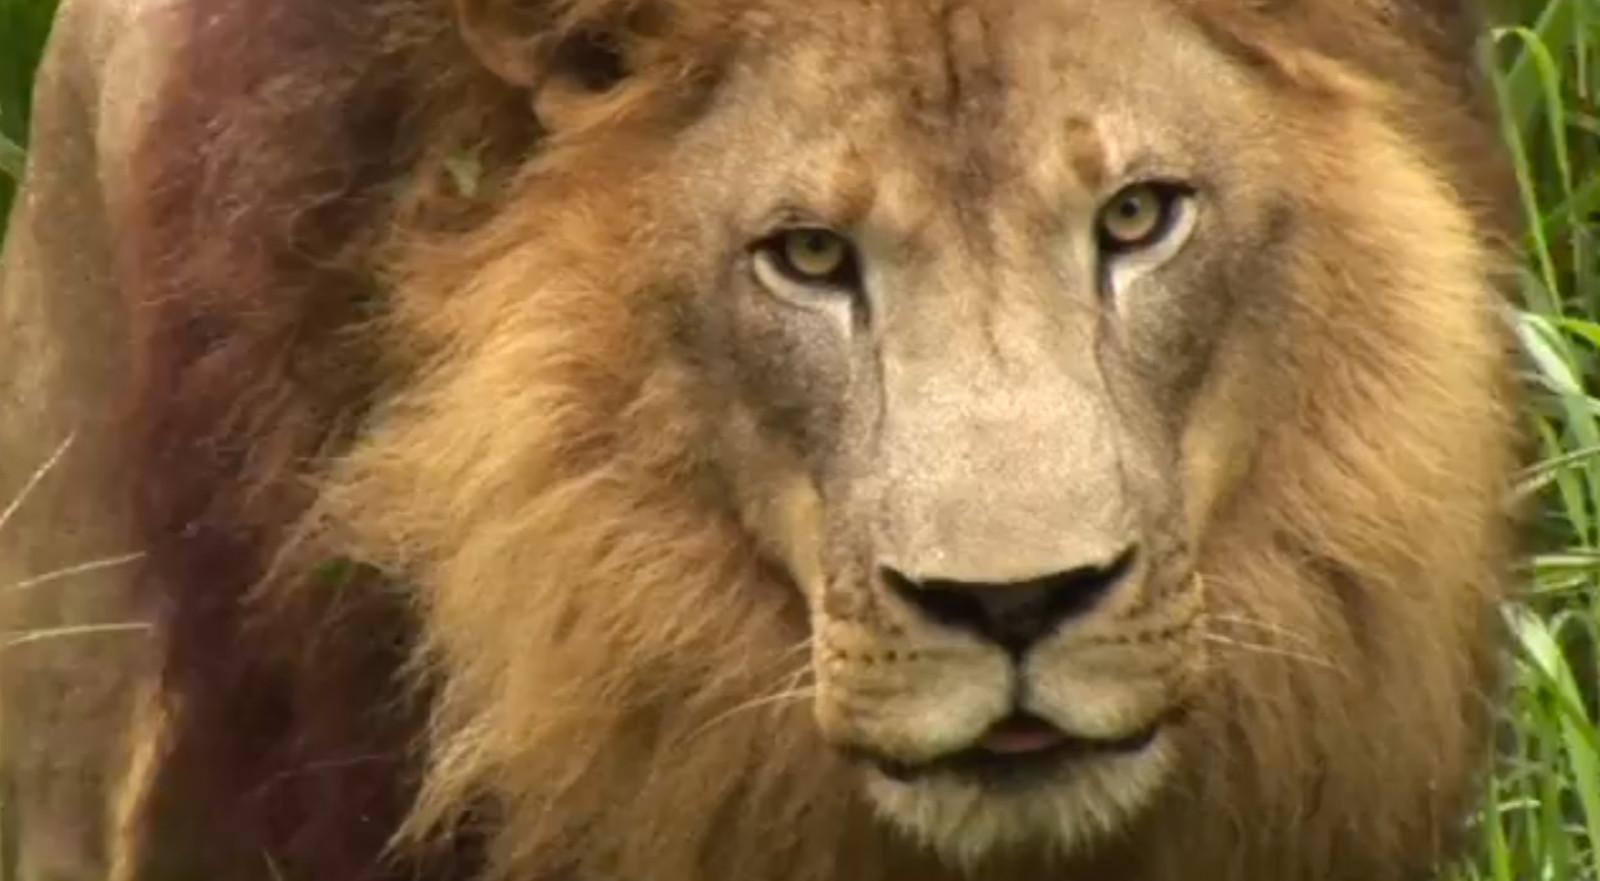 How to Hug a Lion (Video)